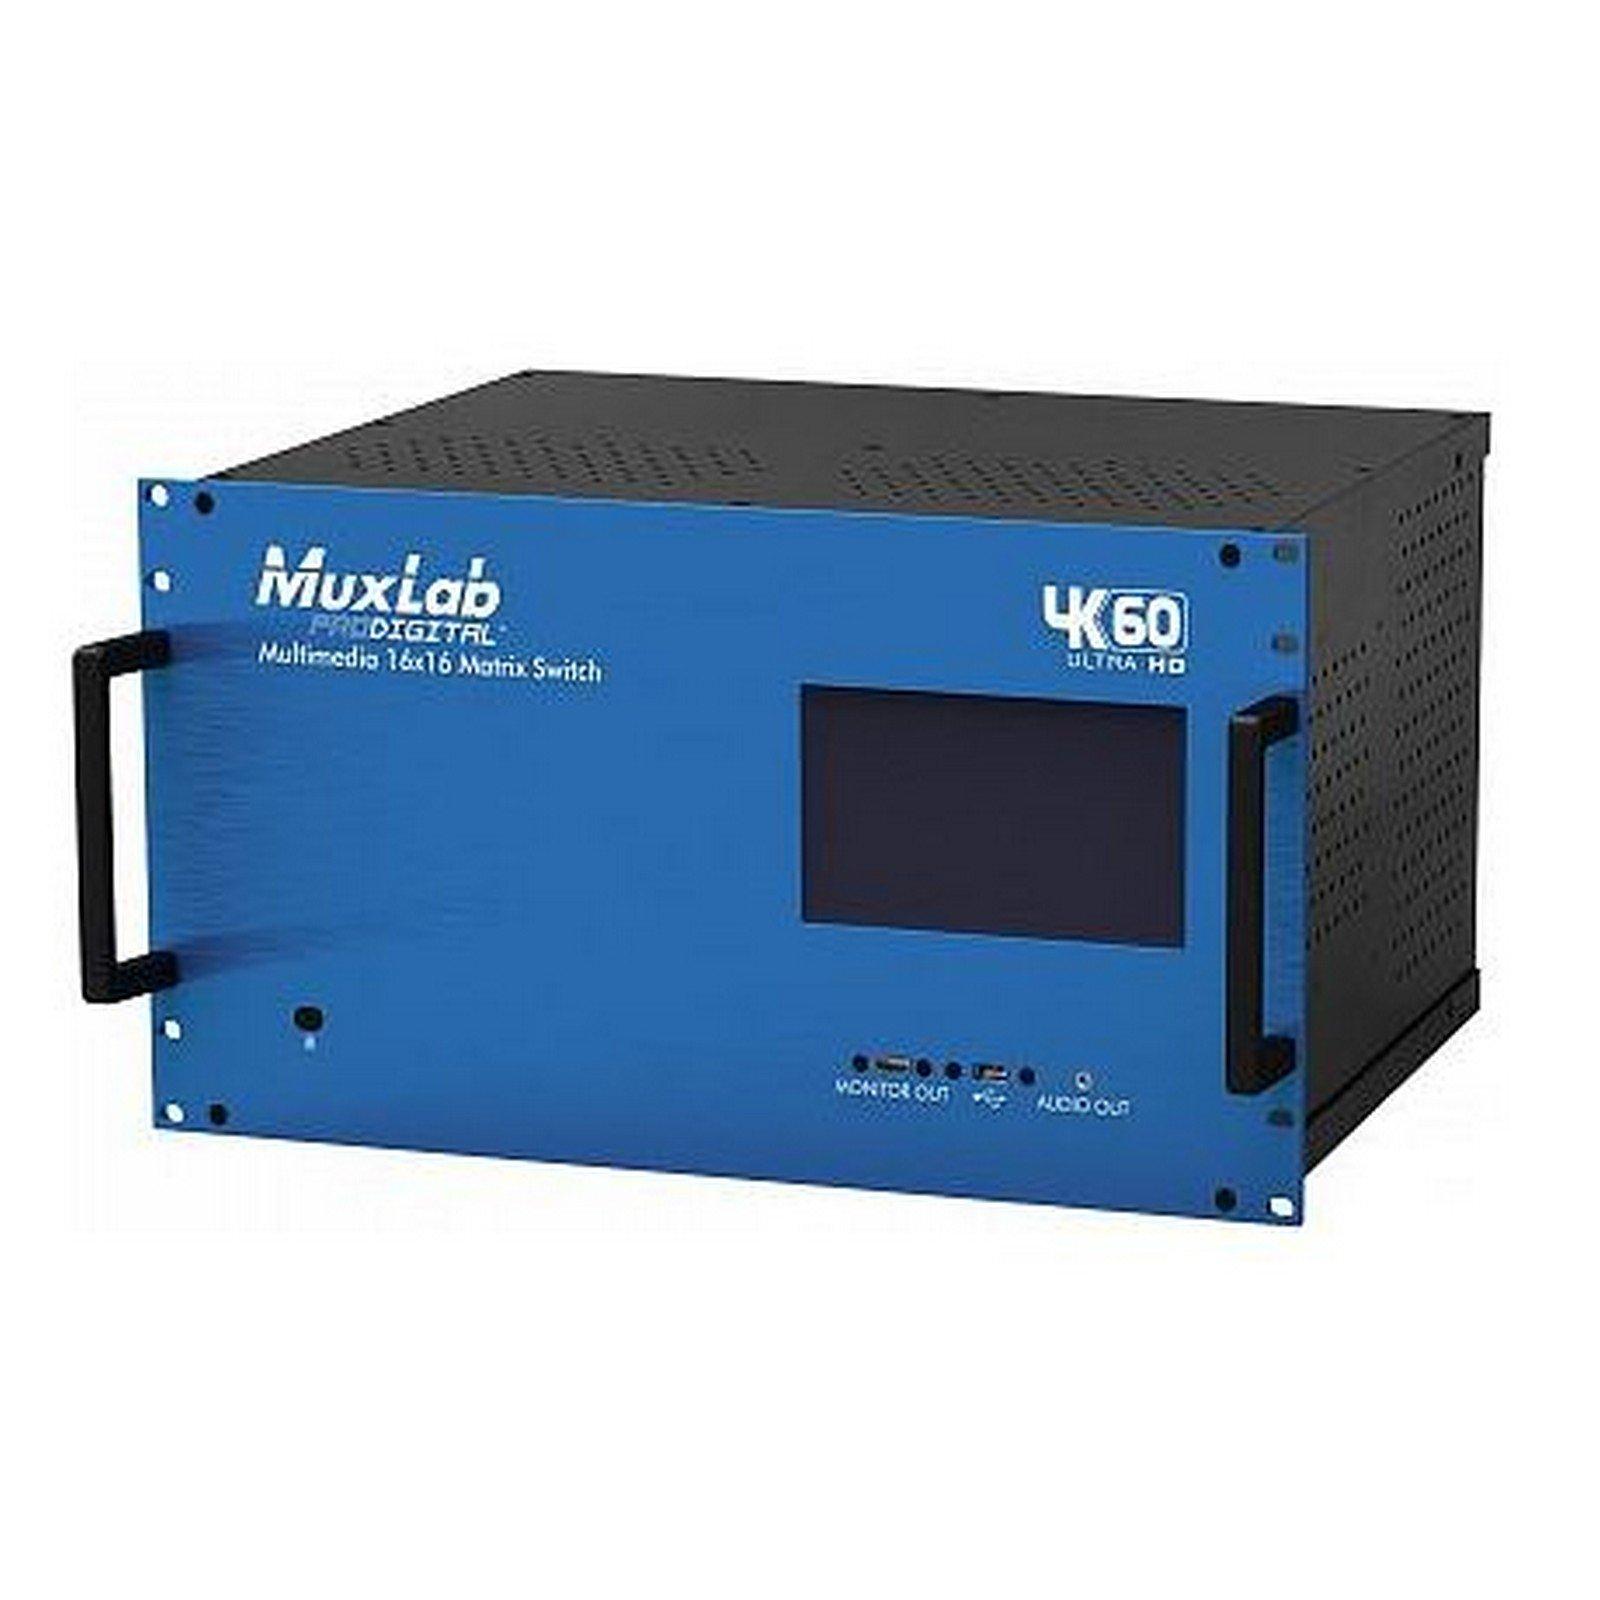 MuxLab 500480-US, 4K60 Multimedia 16X16 Matrix Switch by Muxlab